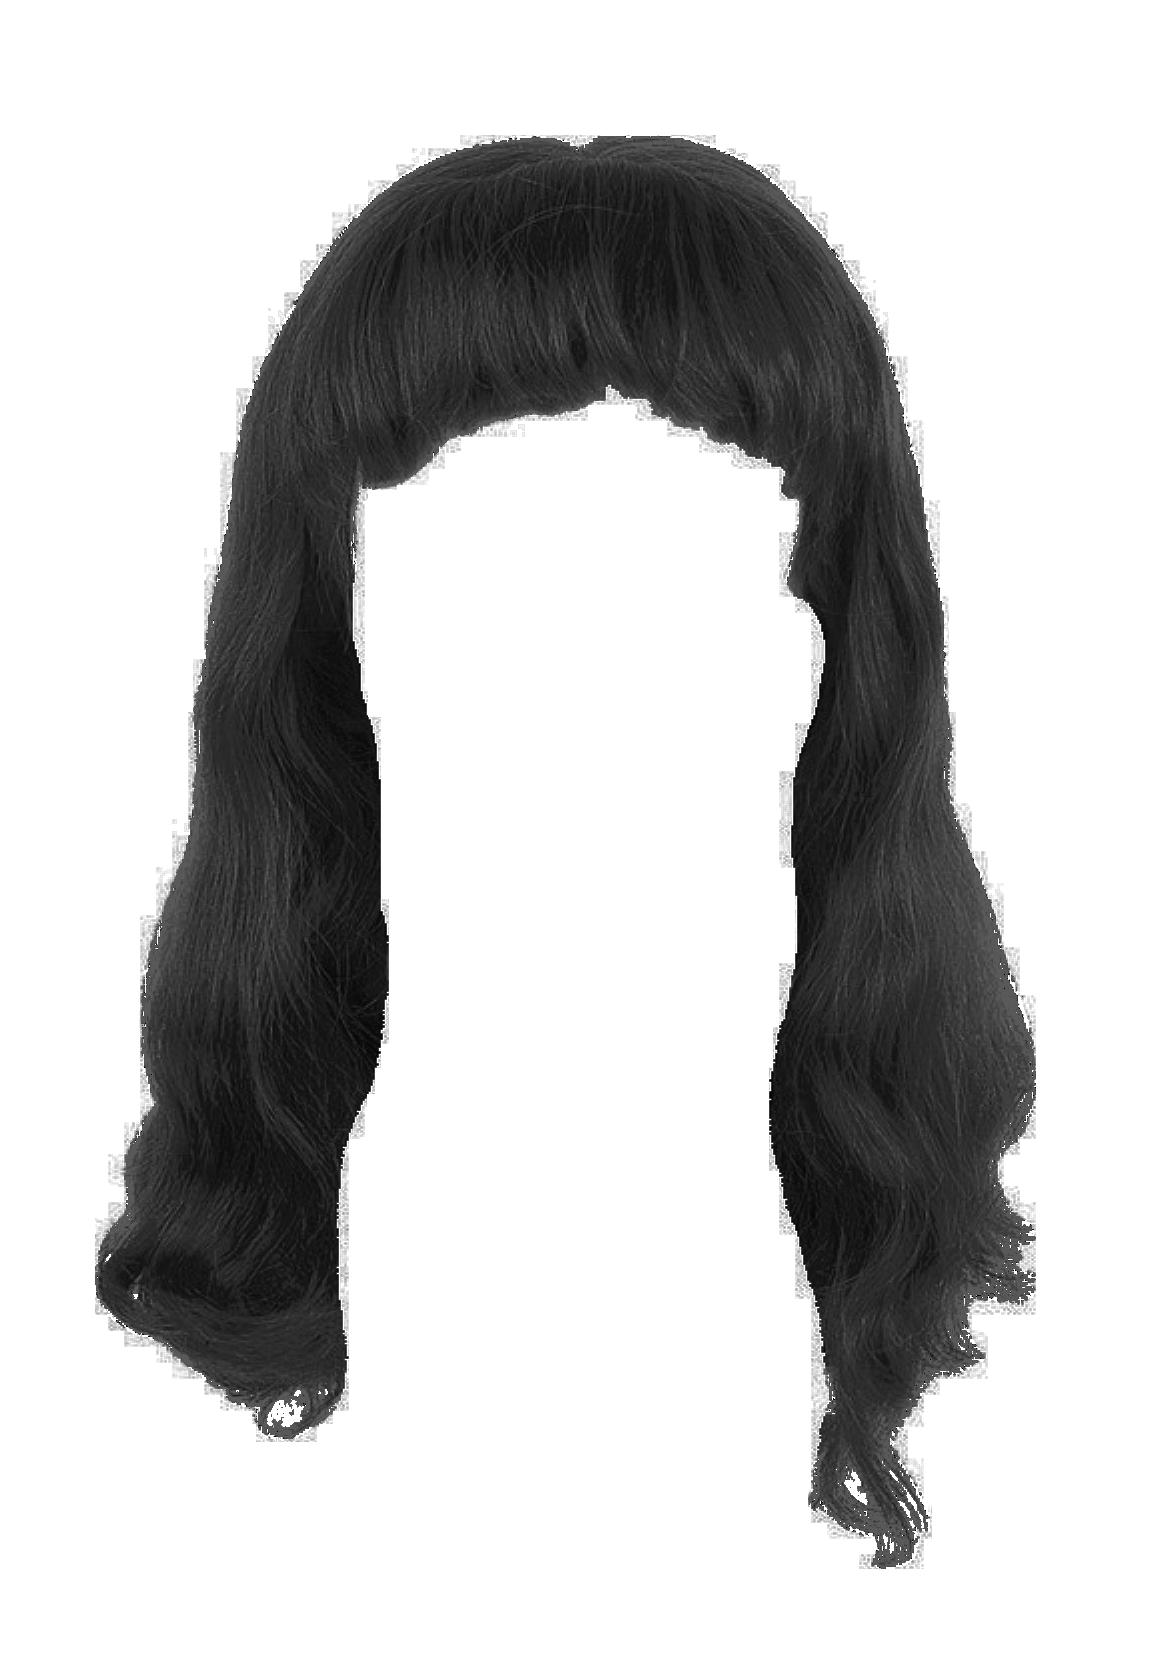 Girl Hair PNG Transparent Image - Hair PNG